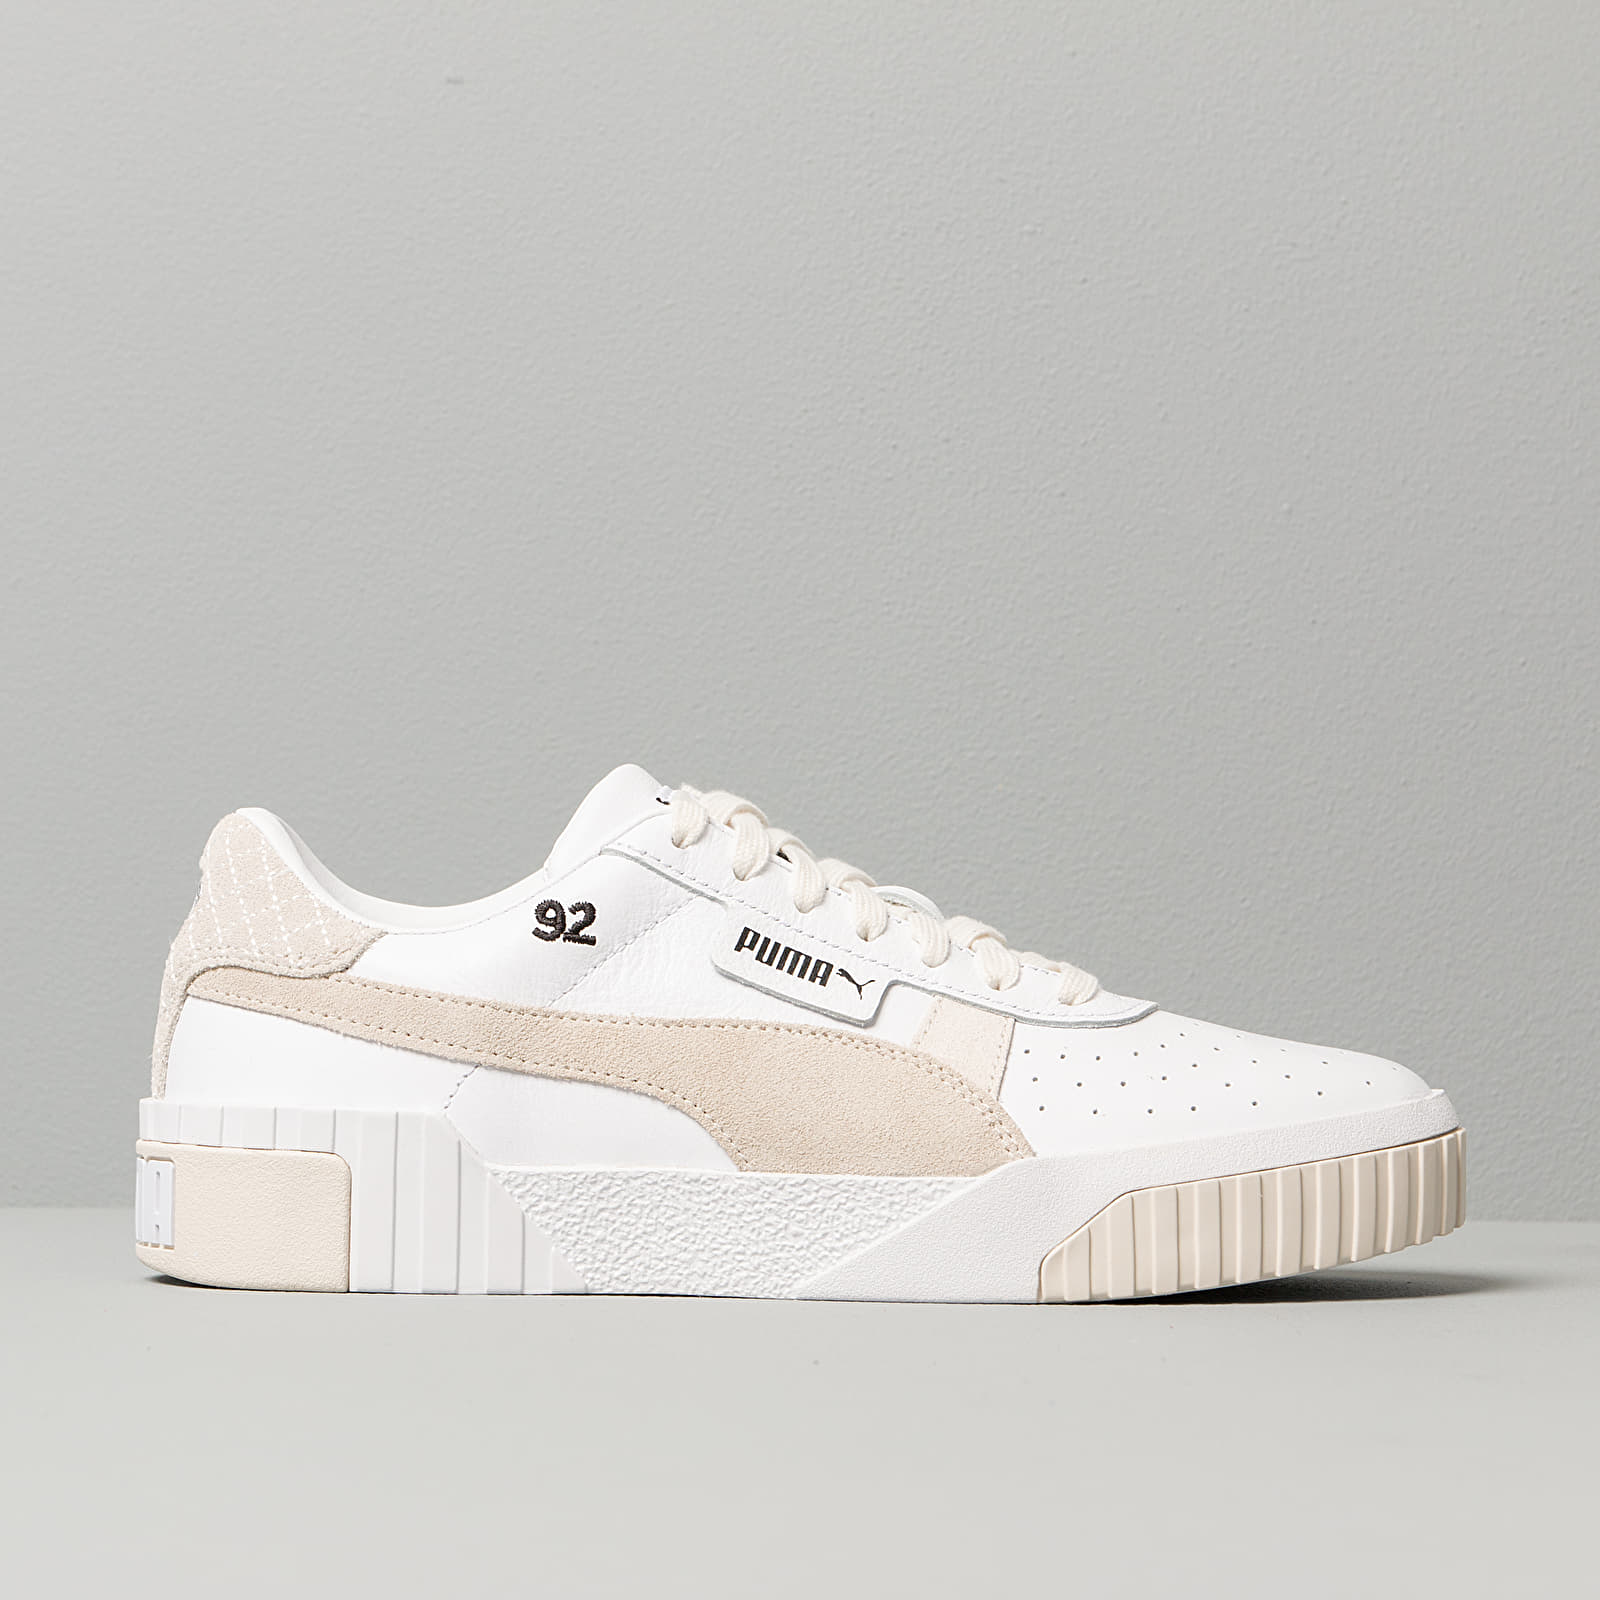 Puma x Selena Gomez Cali Leather Suede Puma White/ Silver Gray | Footshop